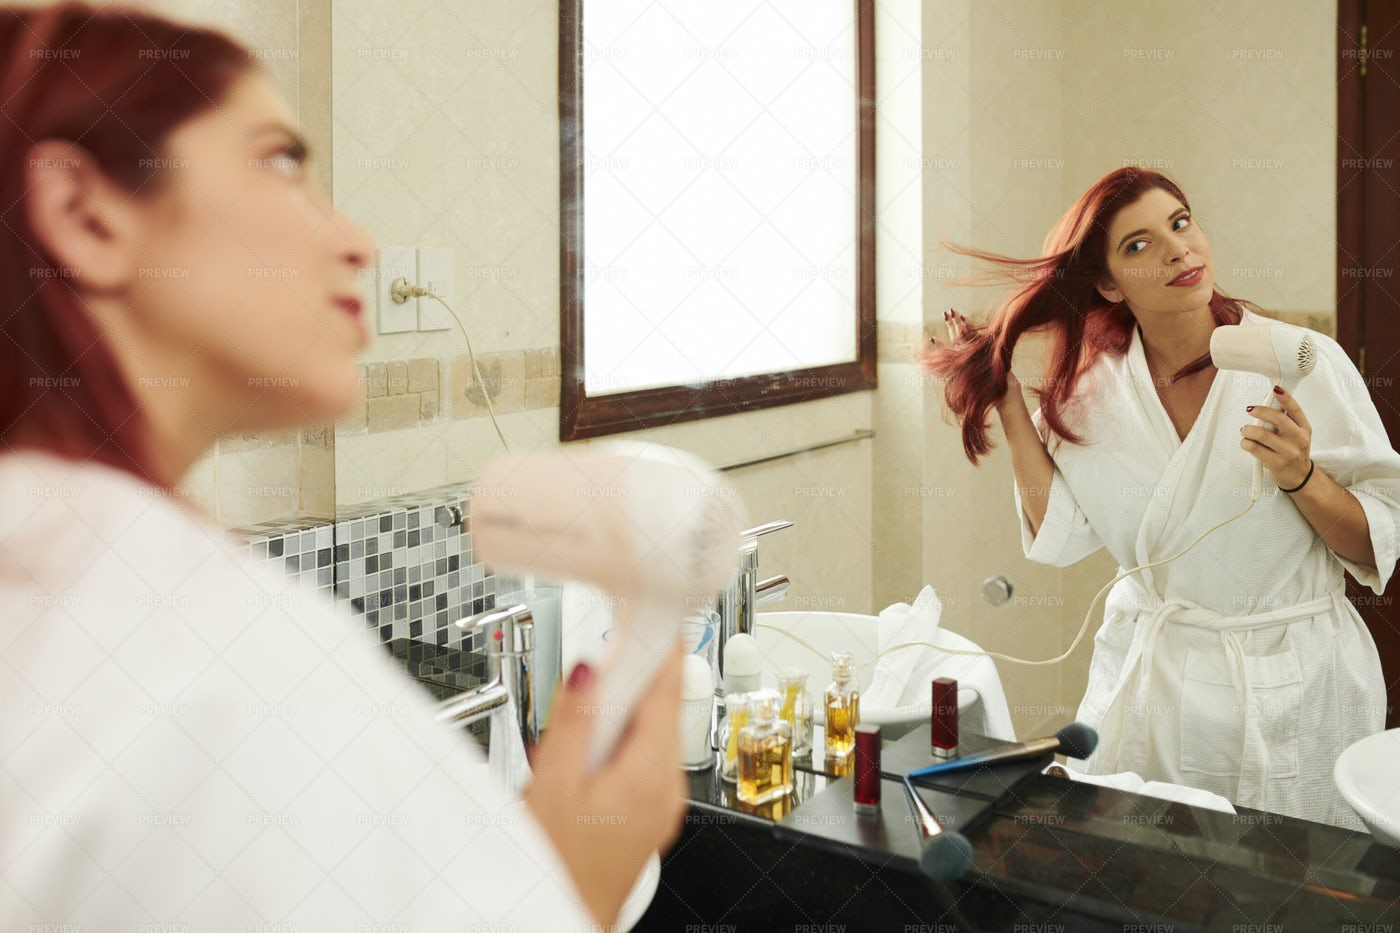 Young Woman Drying Hair: Stock Photos